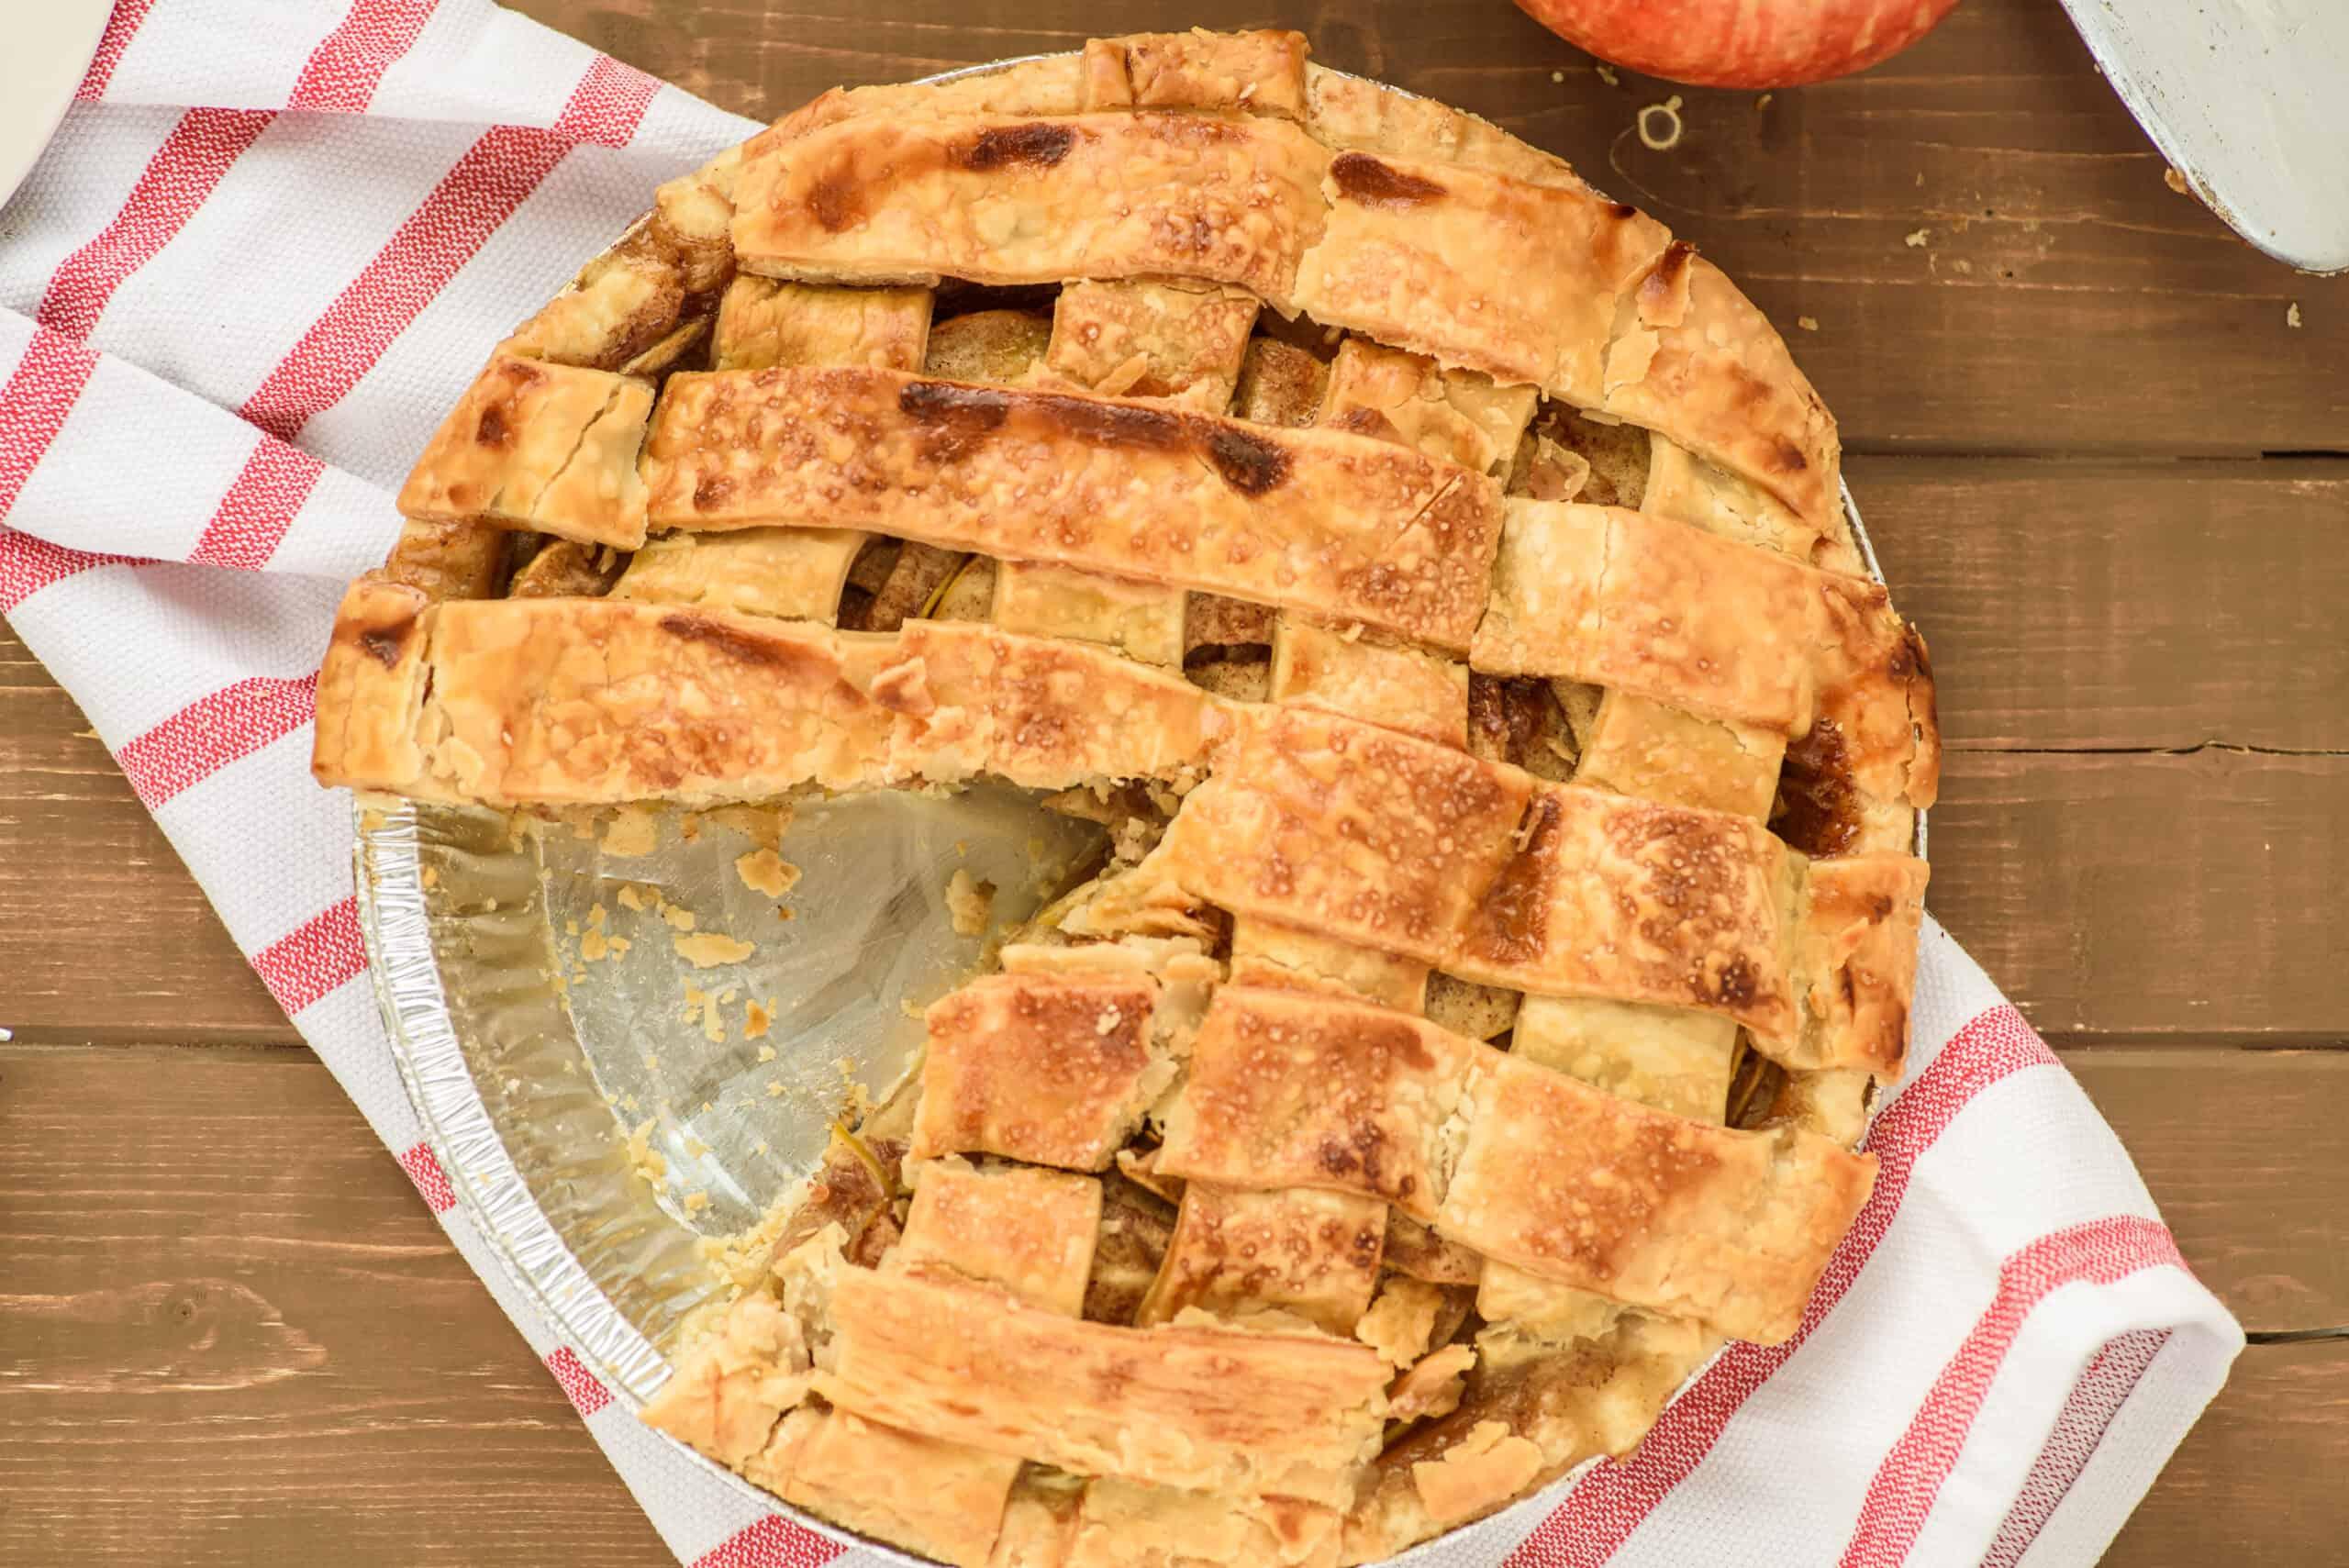 Apple Pie with lattice top. One slice removed.